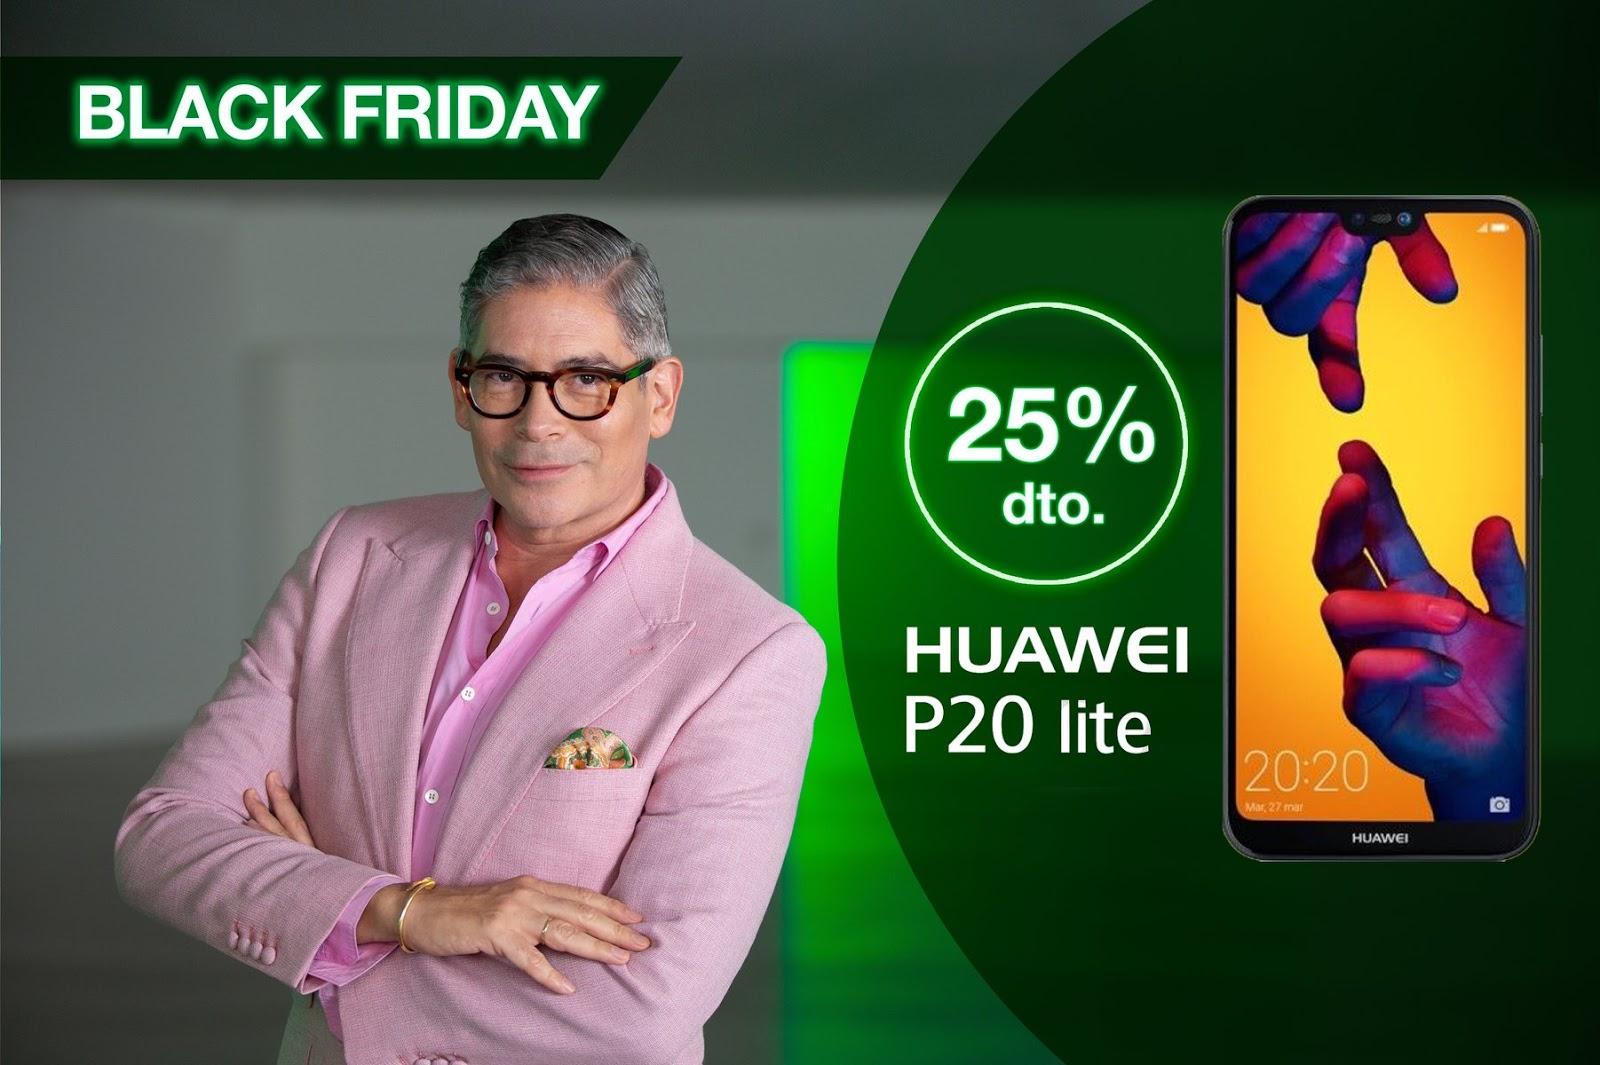 Black Friday Amena Huawei 25% descuento